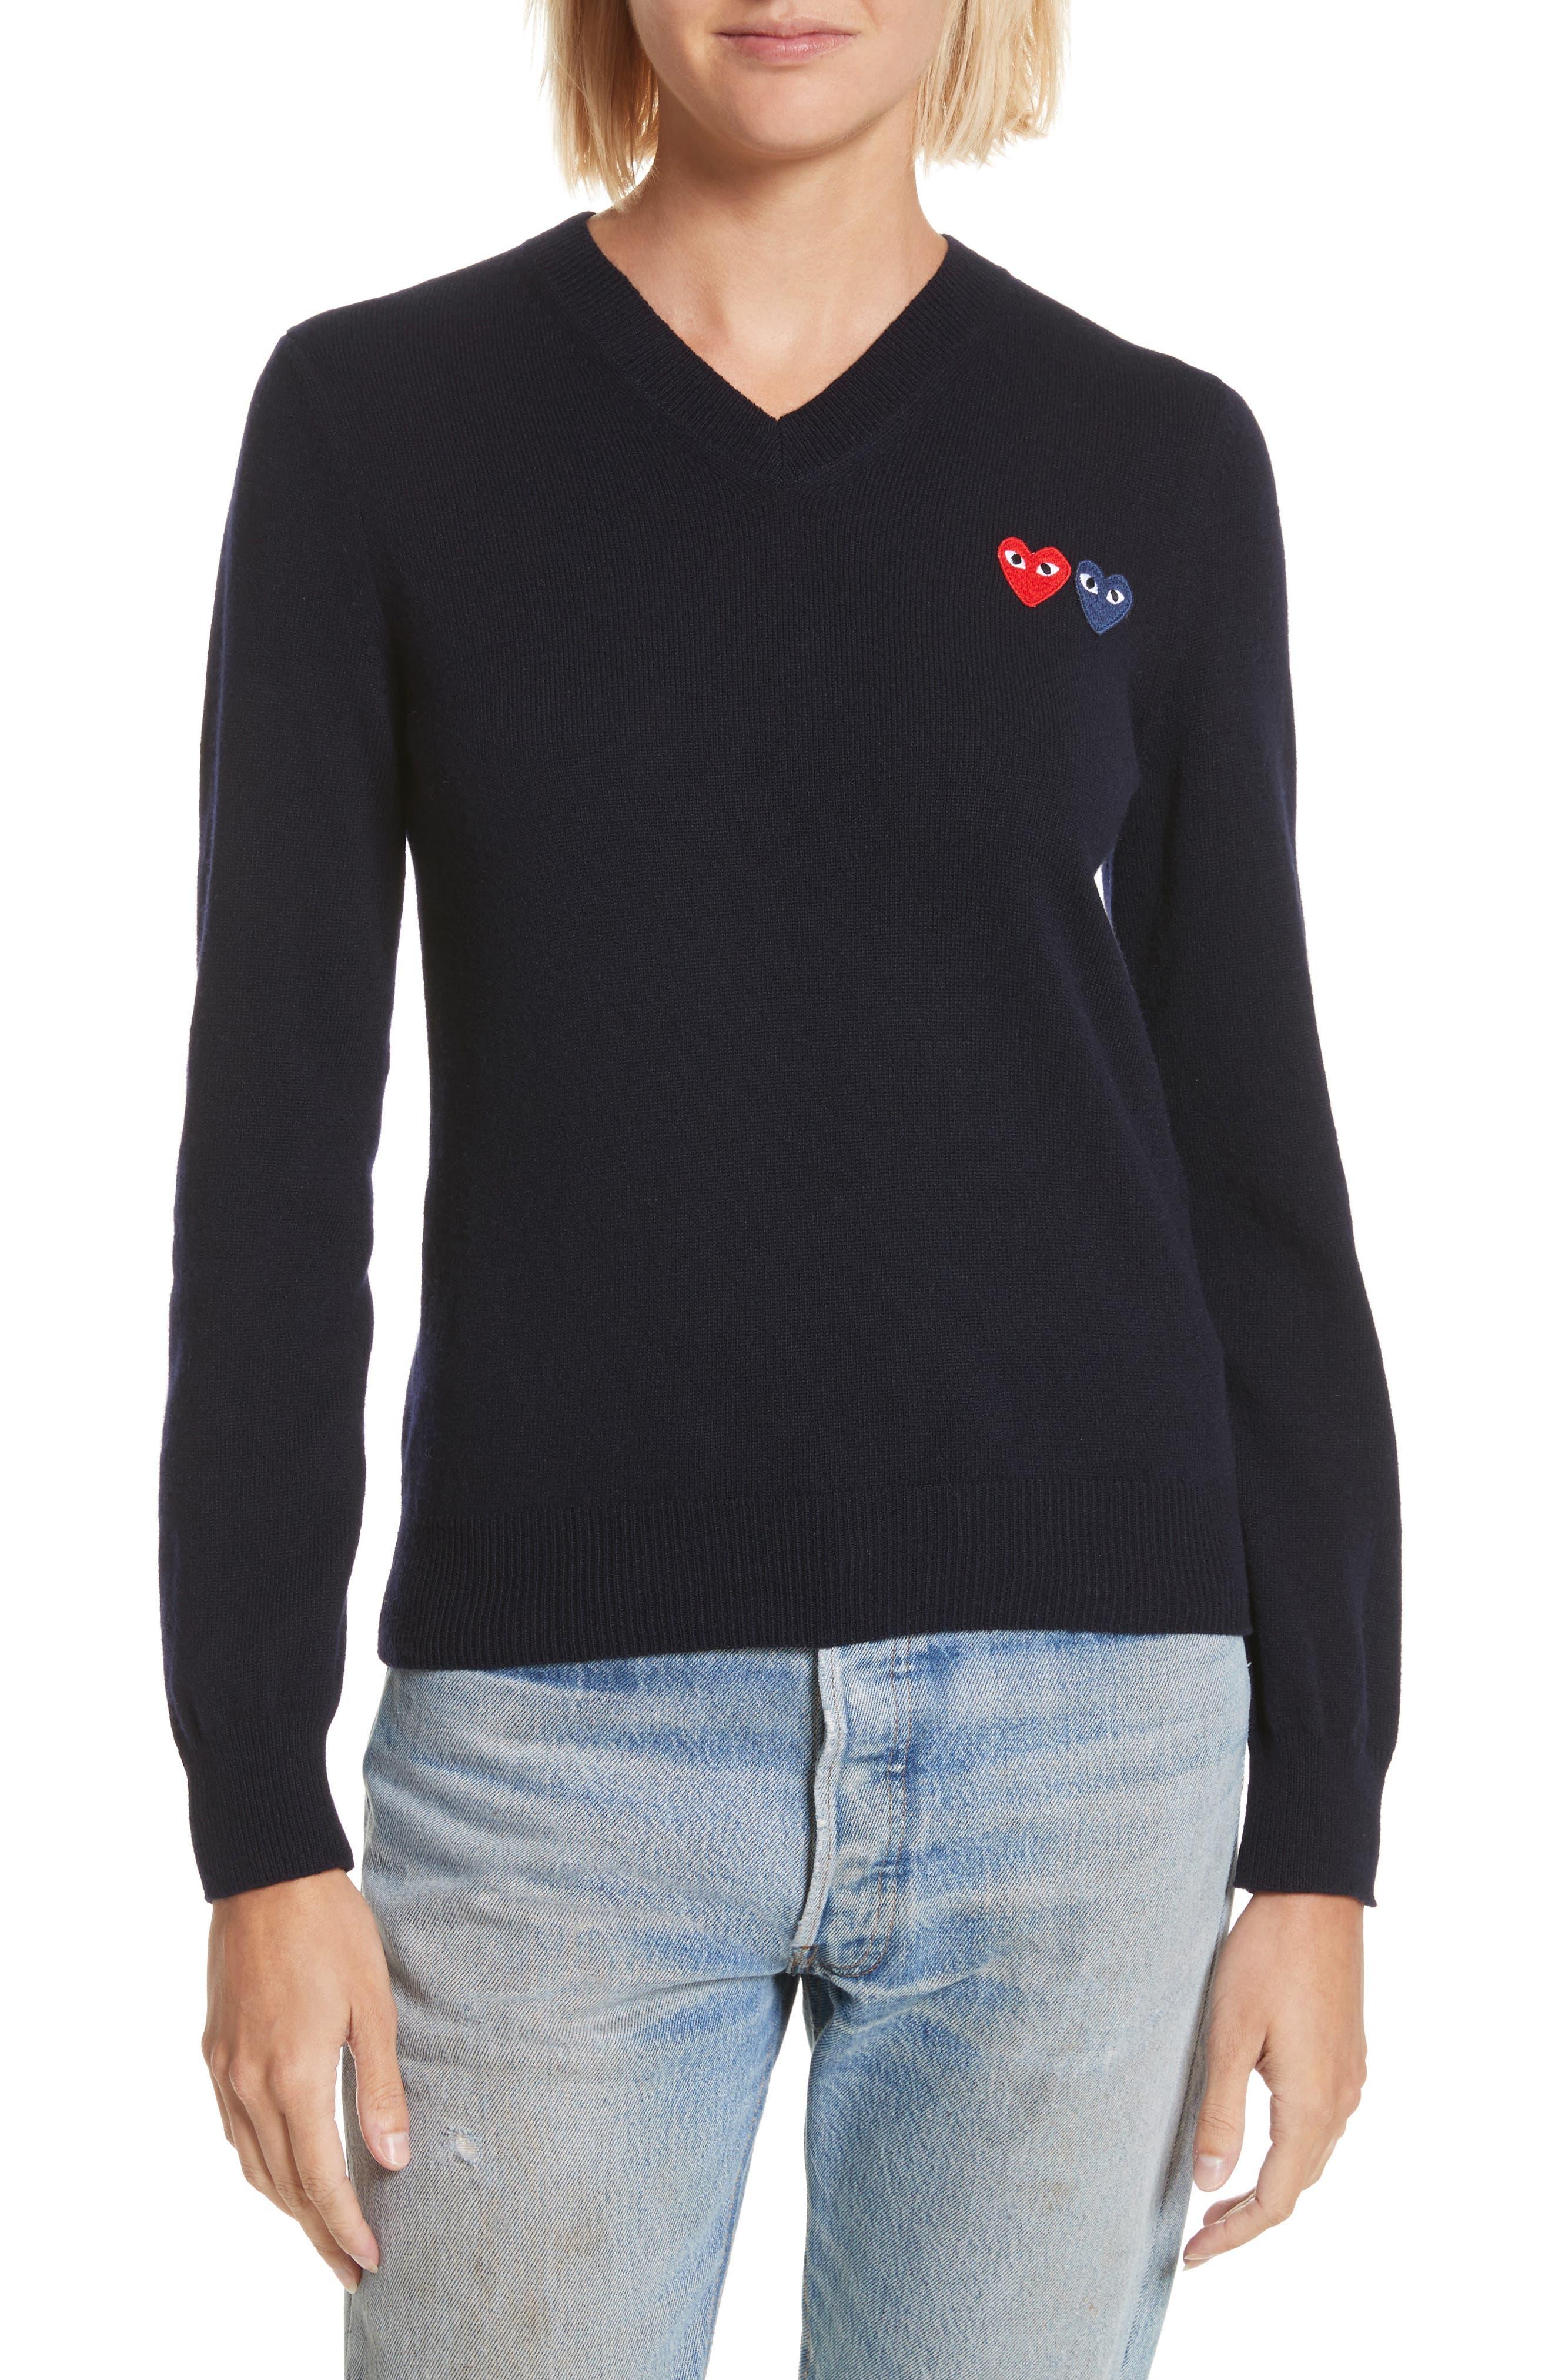 Main Image - Comme des Garçons PLAY Double Heart Wool Sweater